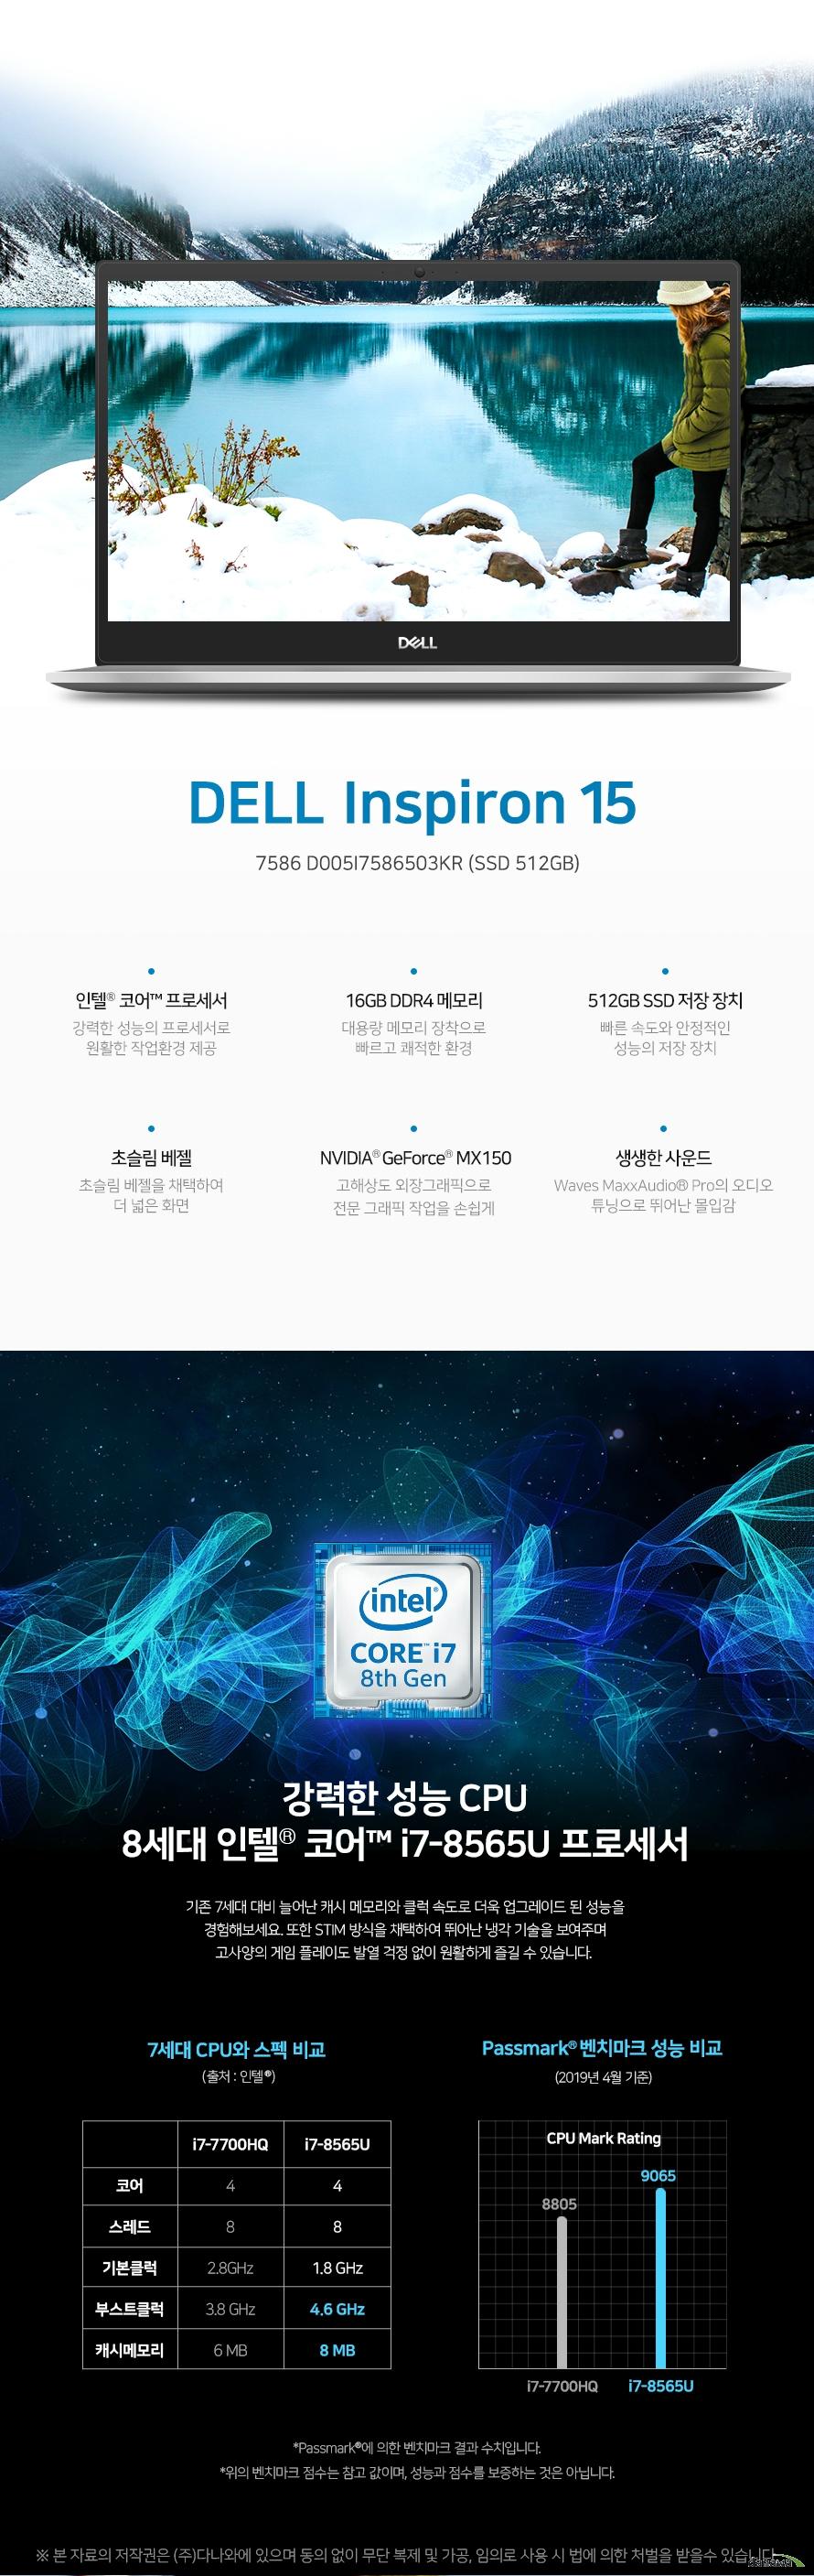 DELL 인스피론 15 7586 D005I7586503KR (SSD 512GB) 상세 스펙 인텔 / 코어i7-8세대 / 위스키레이크 / i7-8565U 1.8GHz(4.6GHz) / 쿼드 코어 / 39.62cm(15.6인치) / 3840x2160(4K UHD) / 광시야각(IPS) / 터치스크린 / 회전LCD / 16GB / DDR4 / M.2 / 512GB / 지포스 MX150 / VRAM:2GB / 802.11 n/ac 무선랜 / 블루투스 있음 / HDMI 2.0 / 웹캠 / USB Type-C / 멀티 리더기 / 키보드 라이트 / 침수지연키보드 / 블록 키보드 / 지문 인식 / 전용 펜 지원 / 56Wh / 윈도우10 프로 / 두께:24mm / 1.97Kg / 용도: 사무/인강용 / 색상: 실버